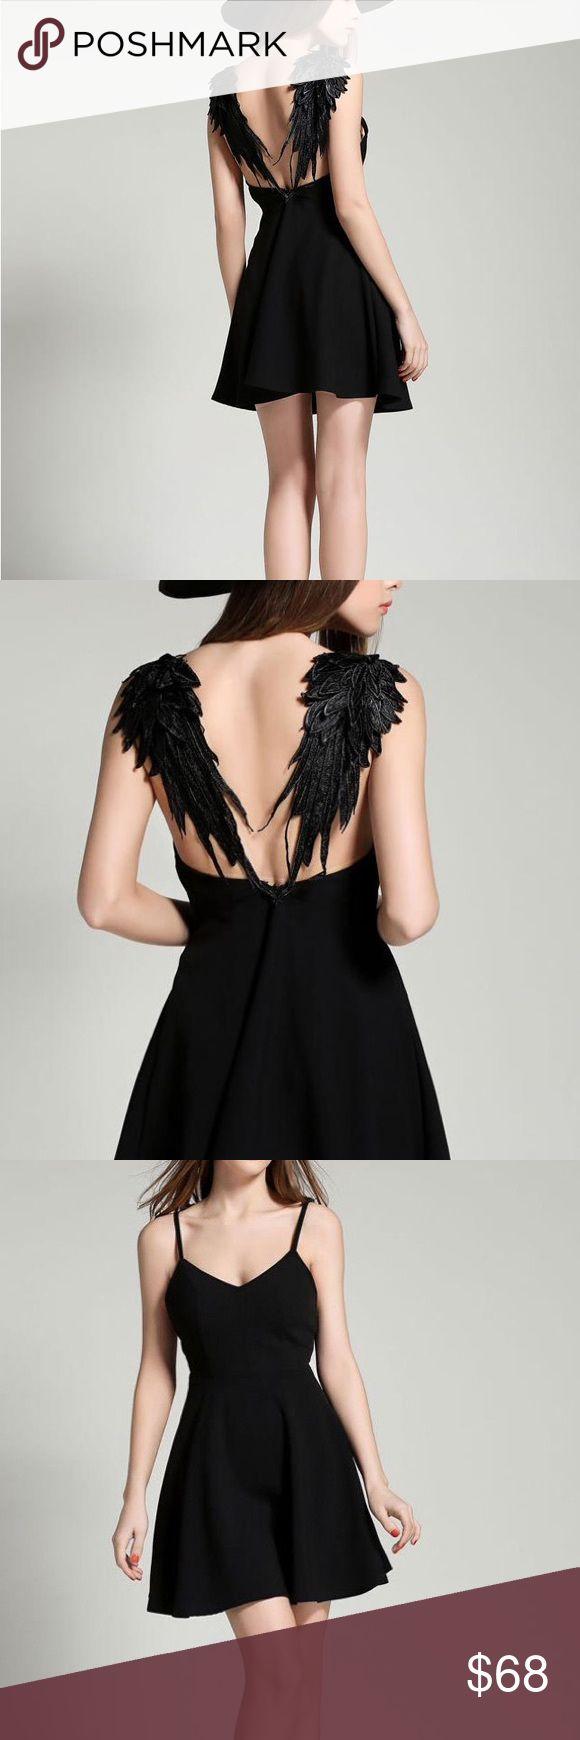 Black Angel Wings Mini Dress Goth Chic Super chic and unique dress. Dresses Mini